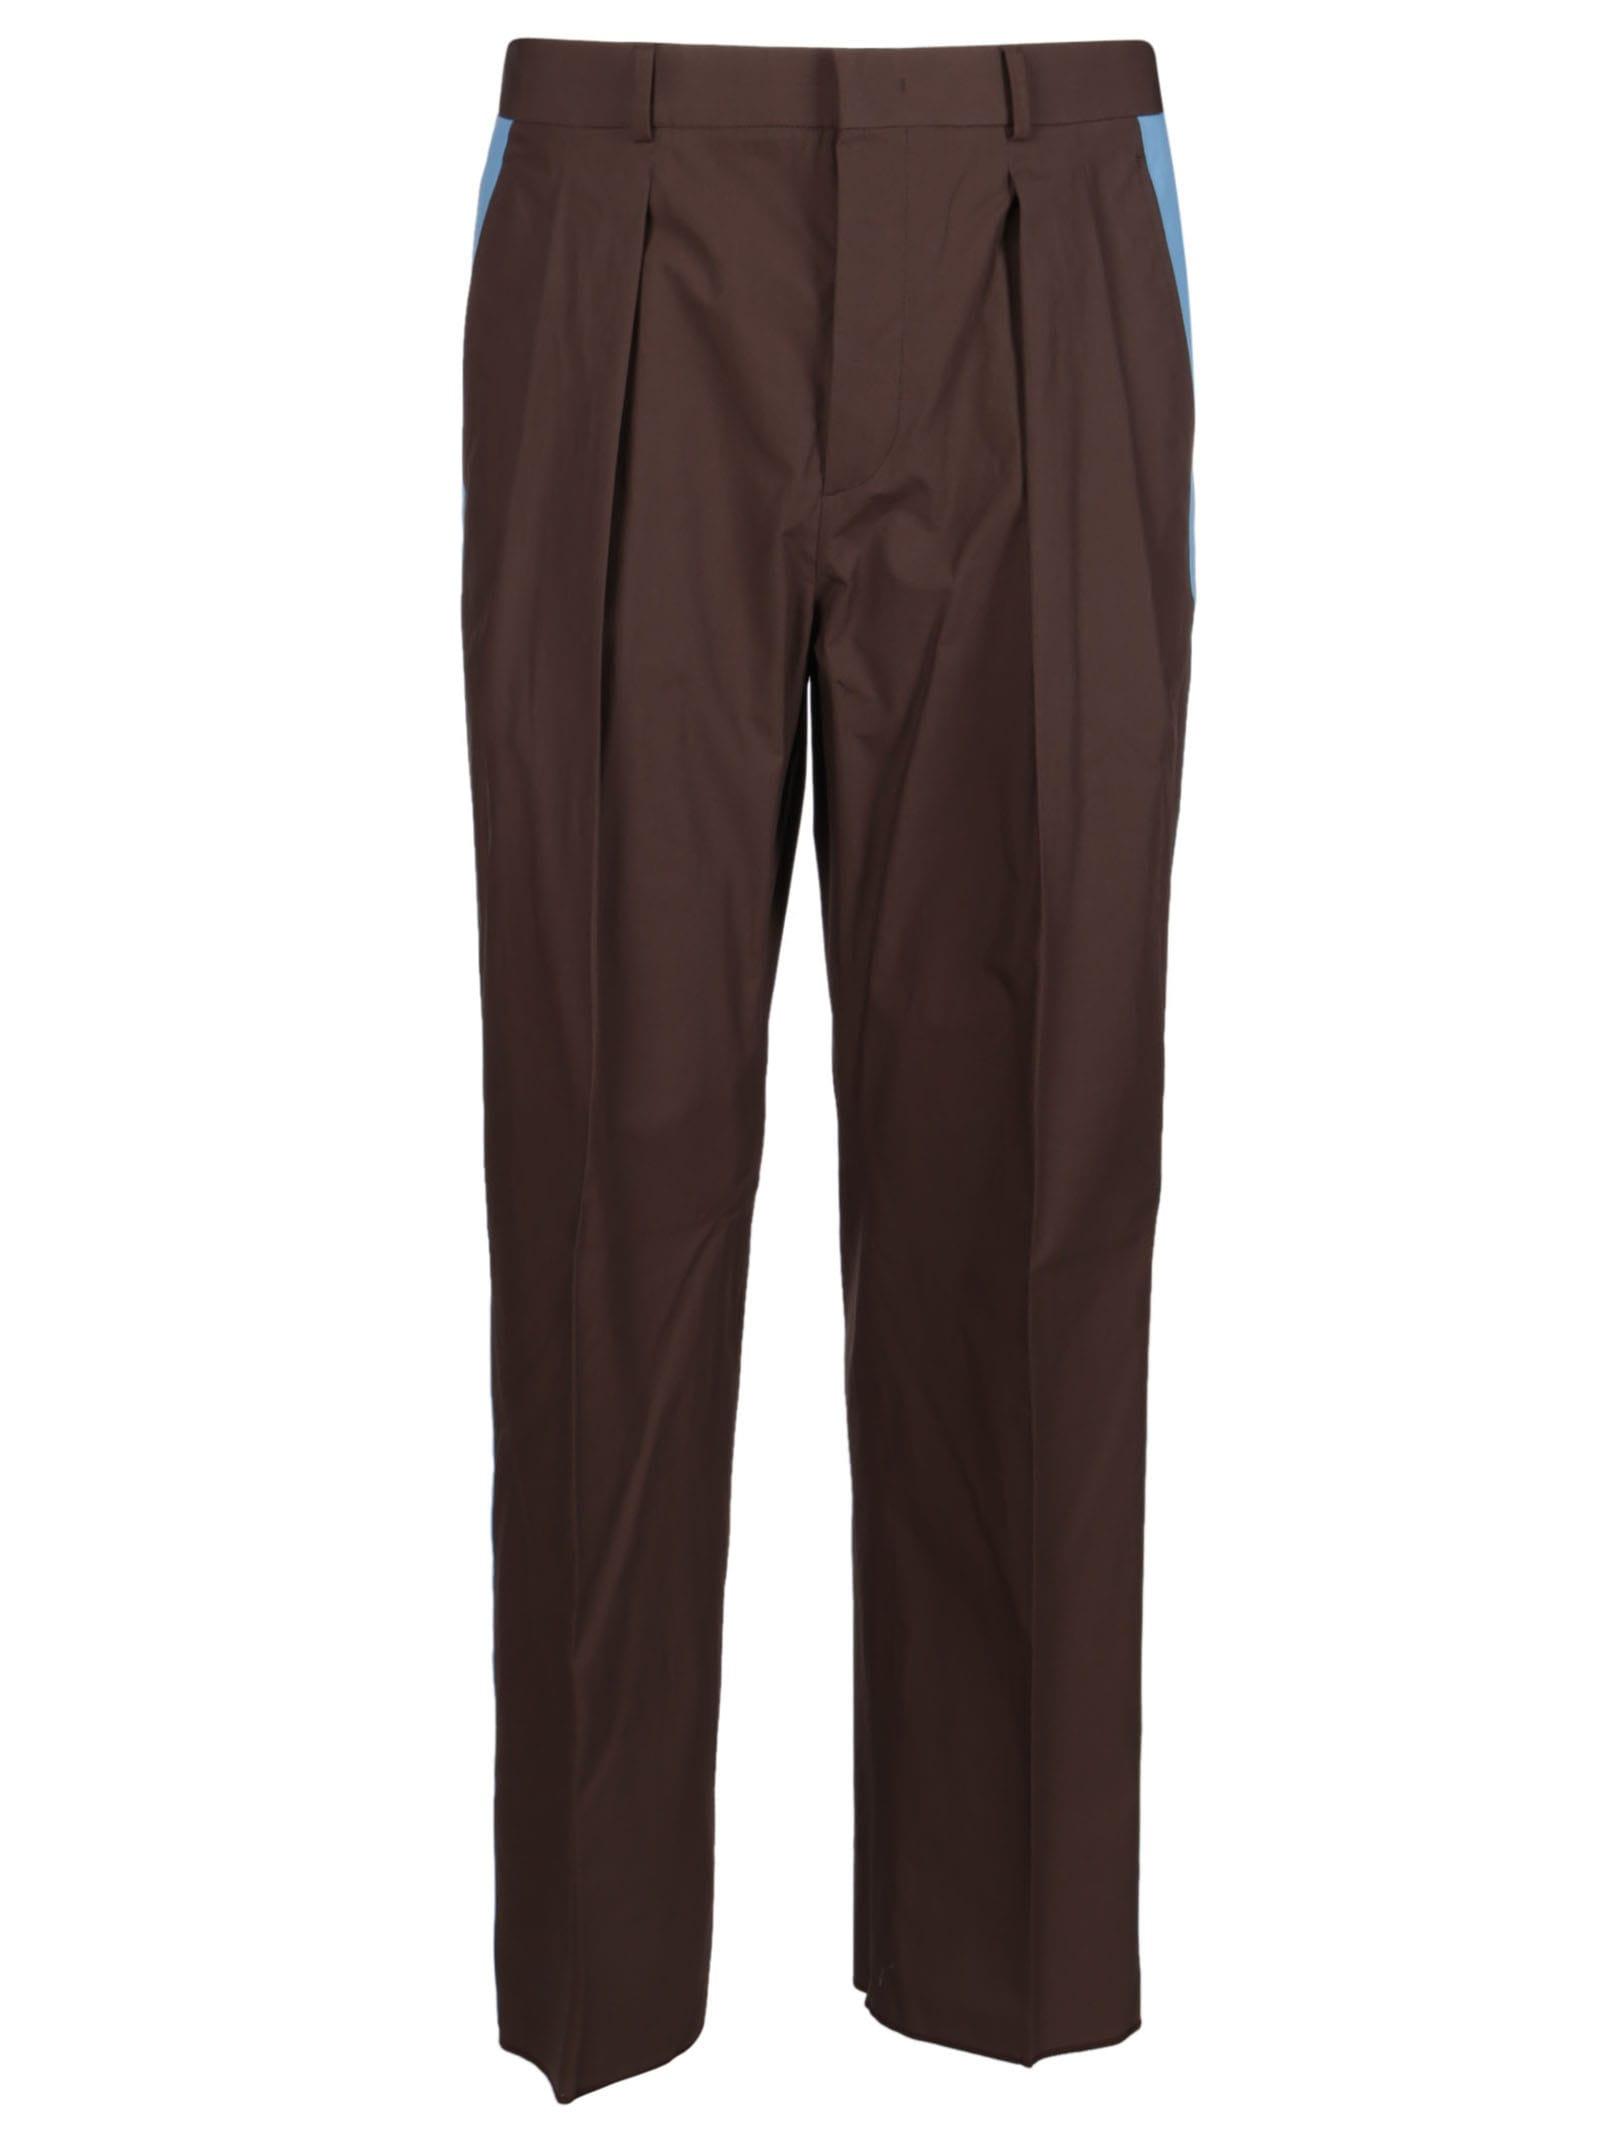 Valentino Brown Cotton Trousers